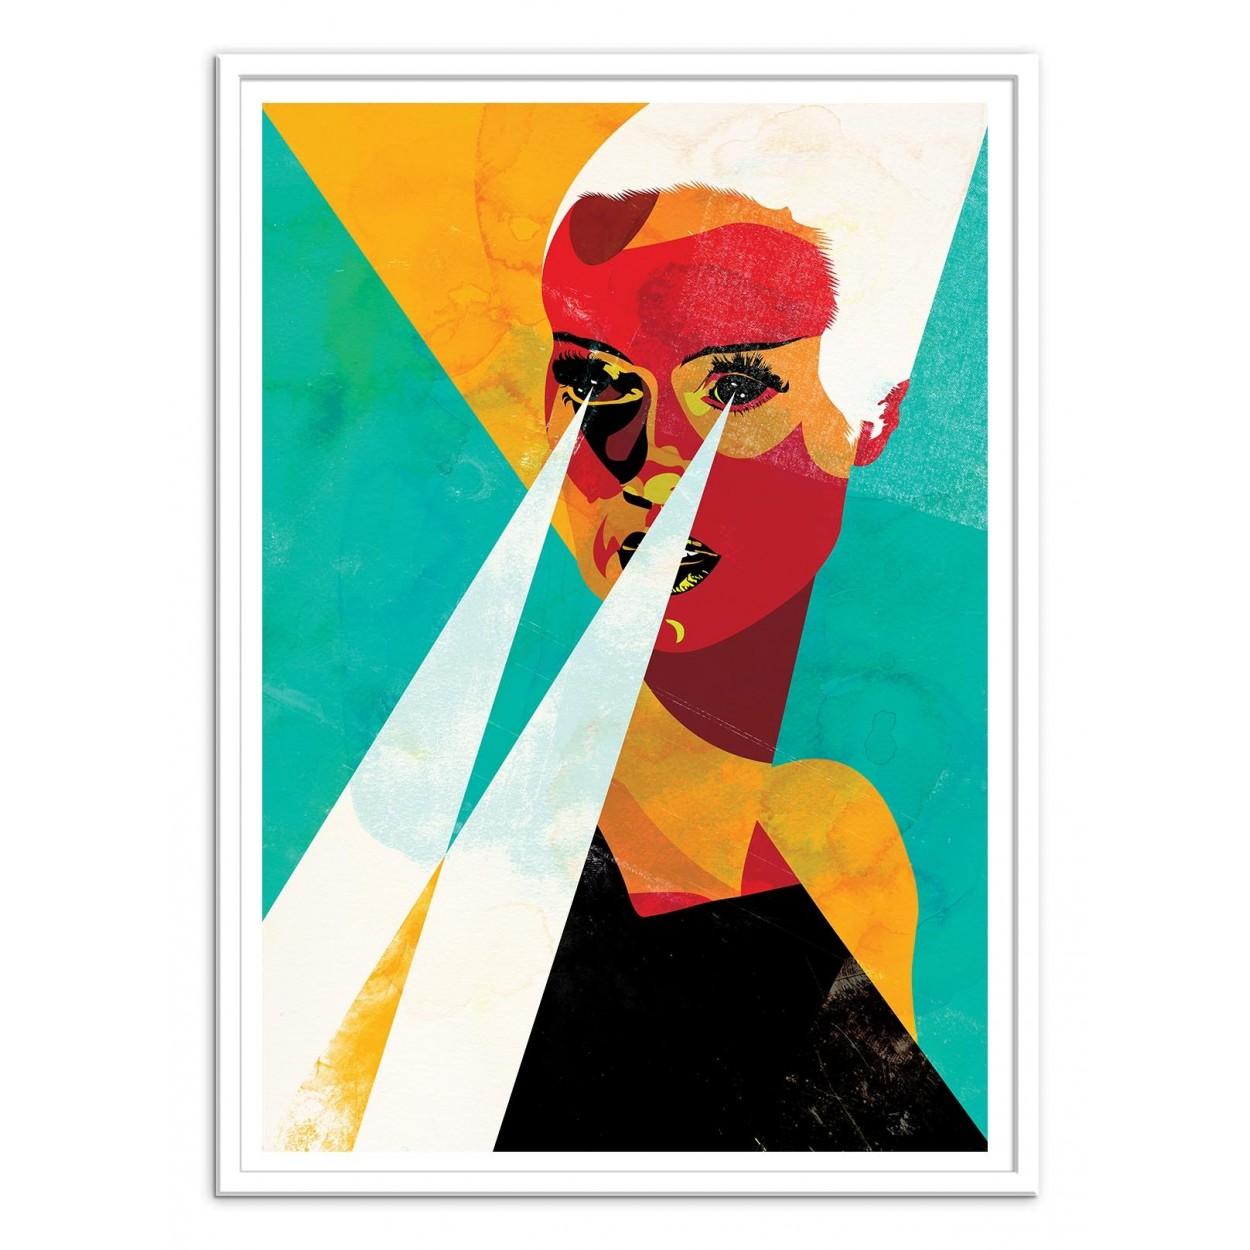 affiche d 39 art poster illustration peinture graphique portrait femme. Black Bedroom Furniture Sets. Home Design Ideas